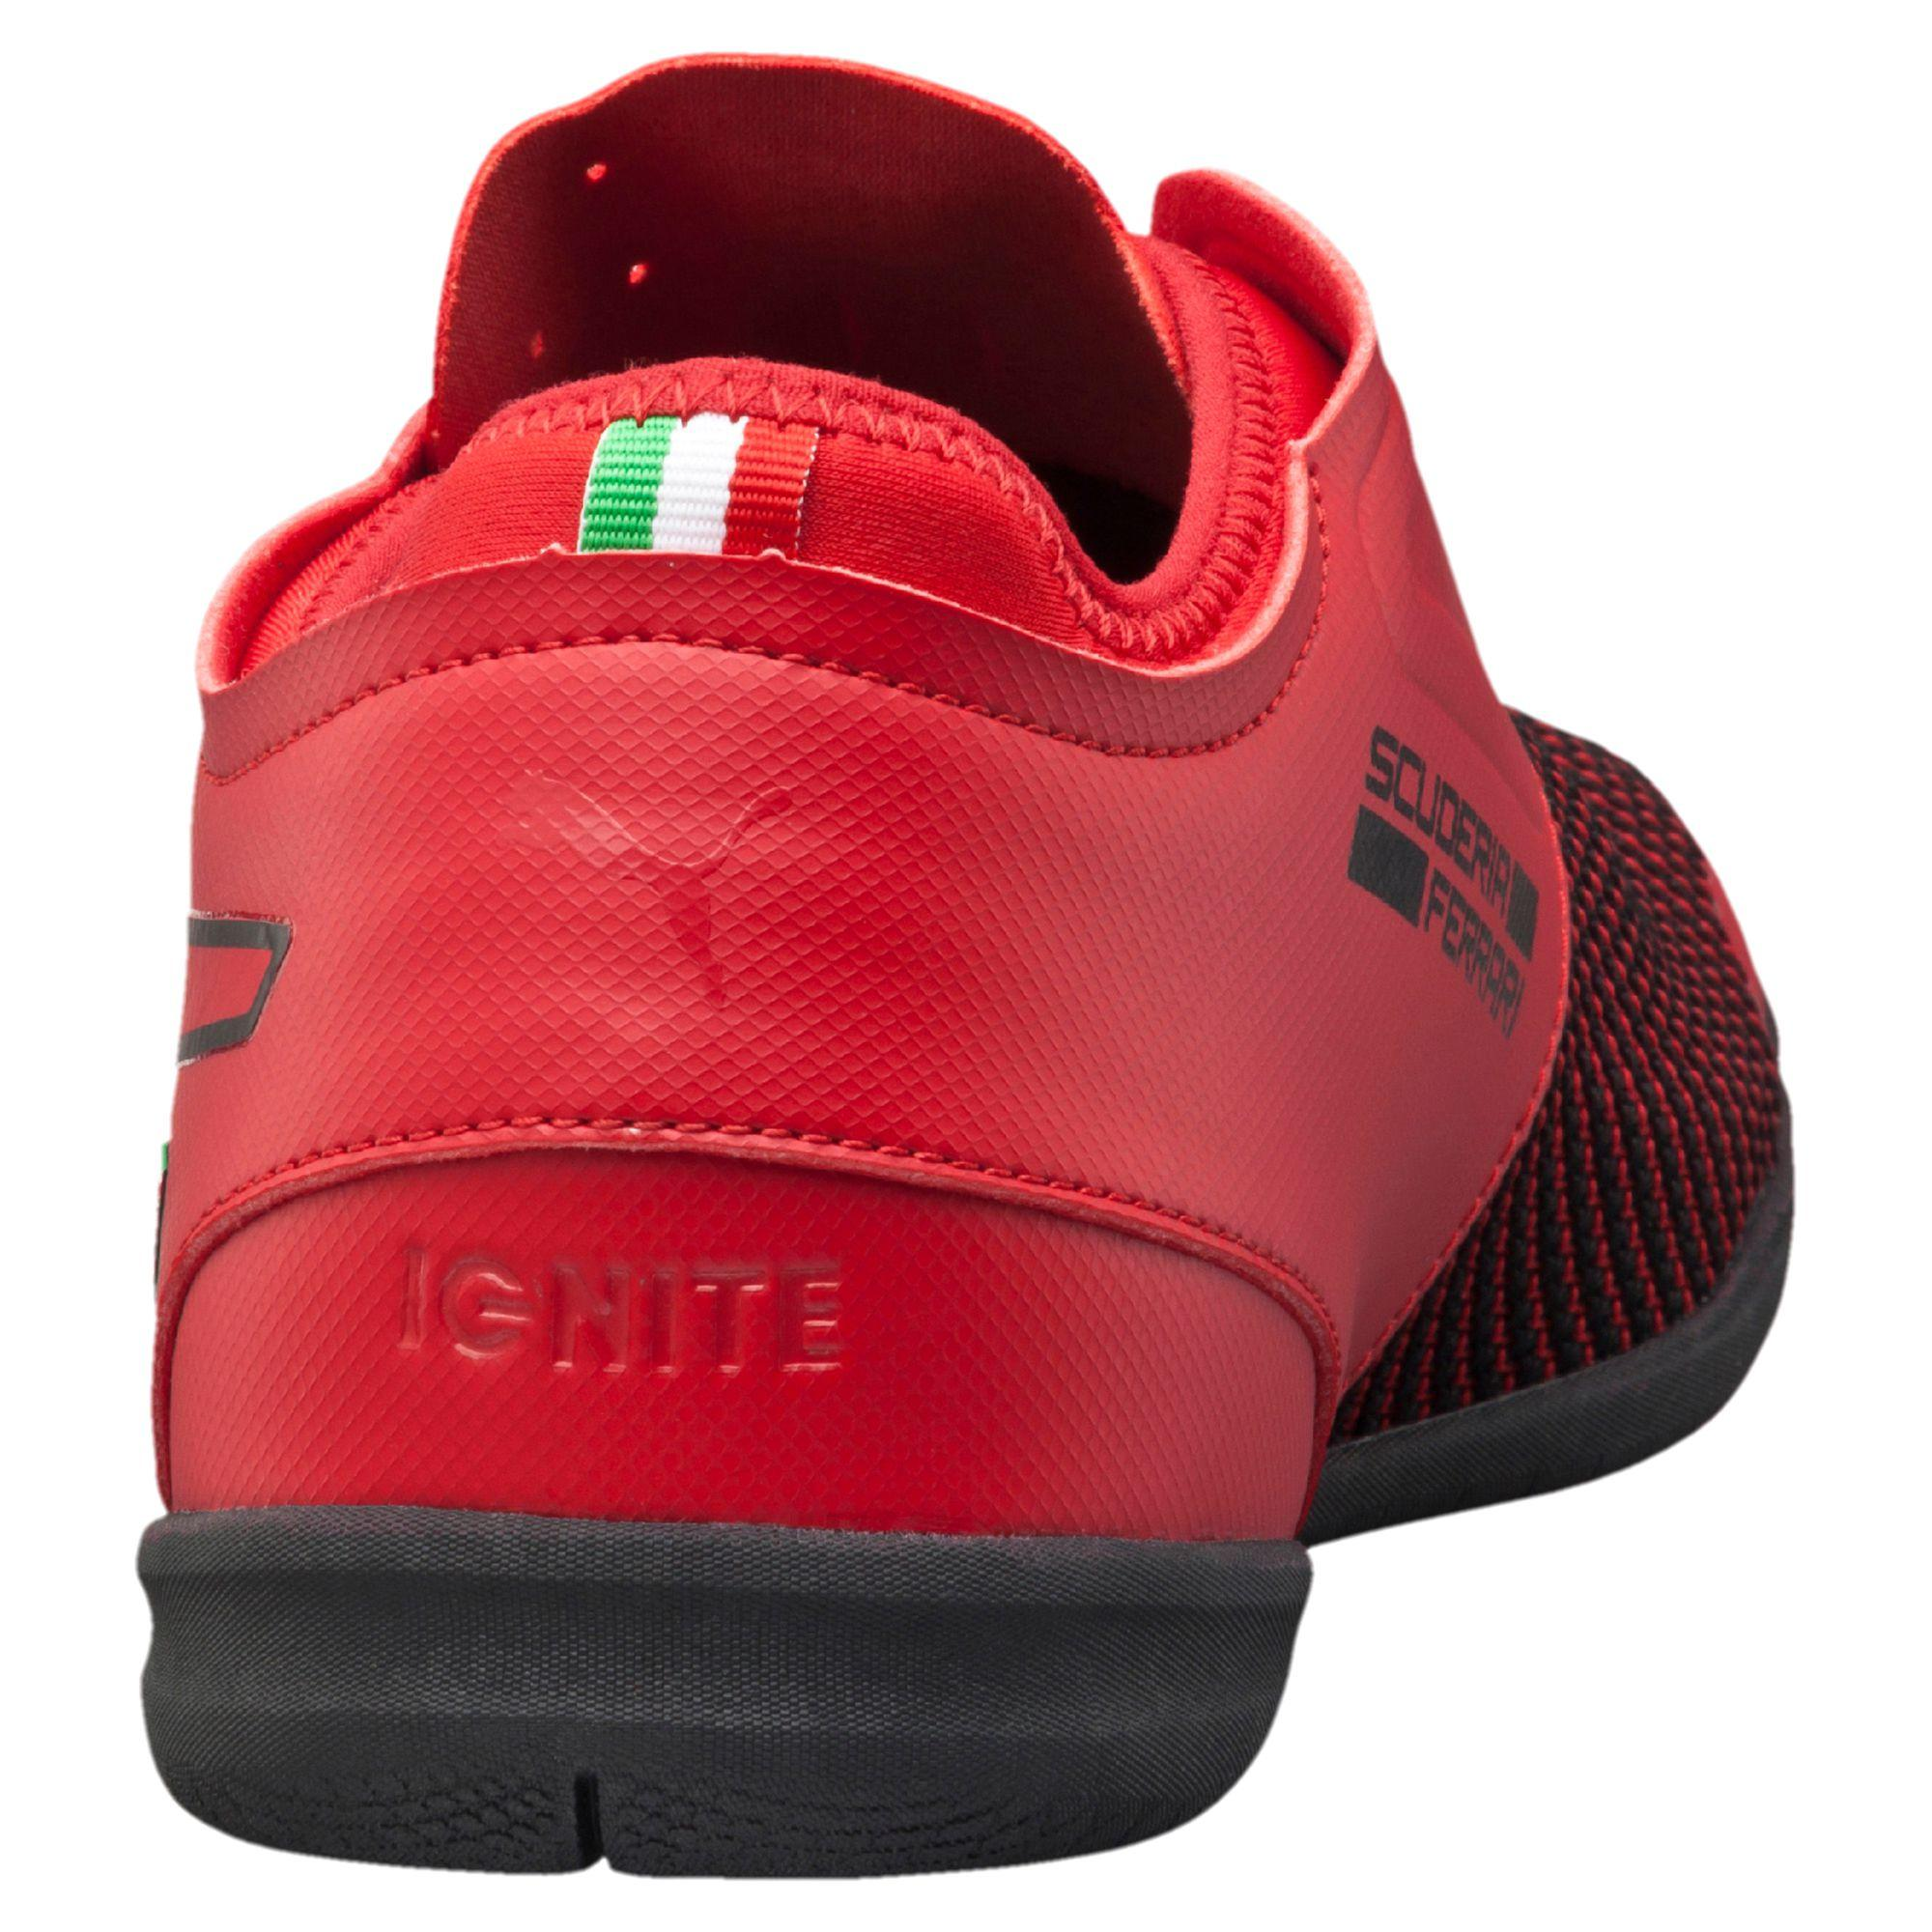 ee4feafb5f7ed5 Lyst - PUMA Ferrari Changer Ignite Statement Men s Shoes in Black ...